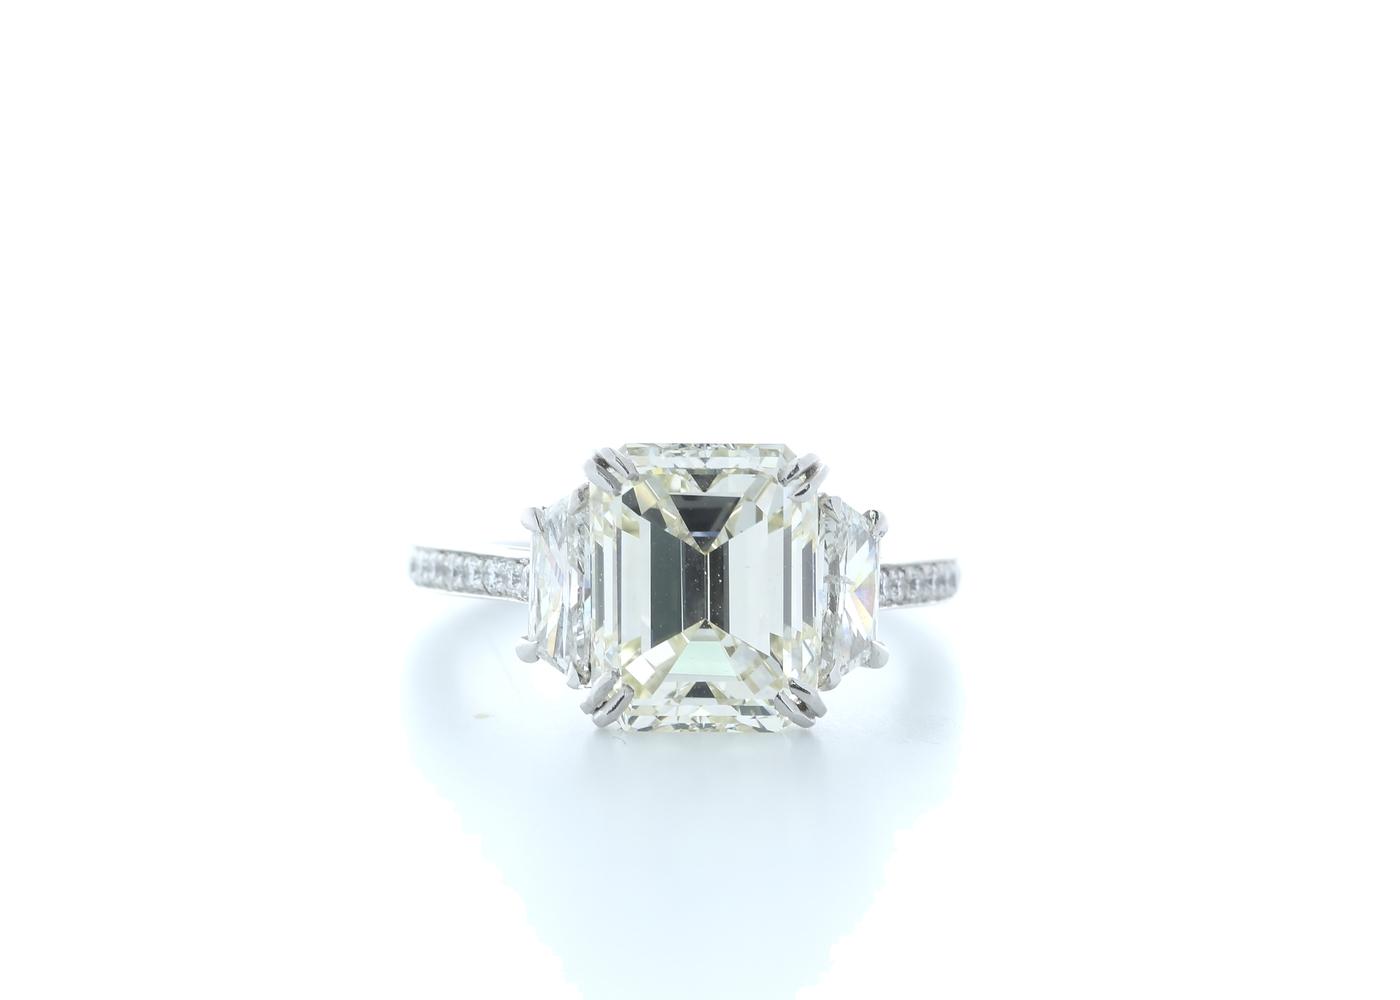 18ct White Gold Emerald Cut Diamond Ring 5.31 (4.56) Carats